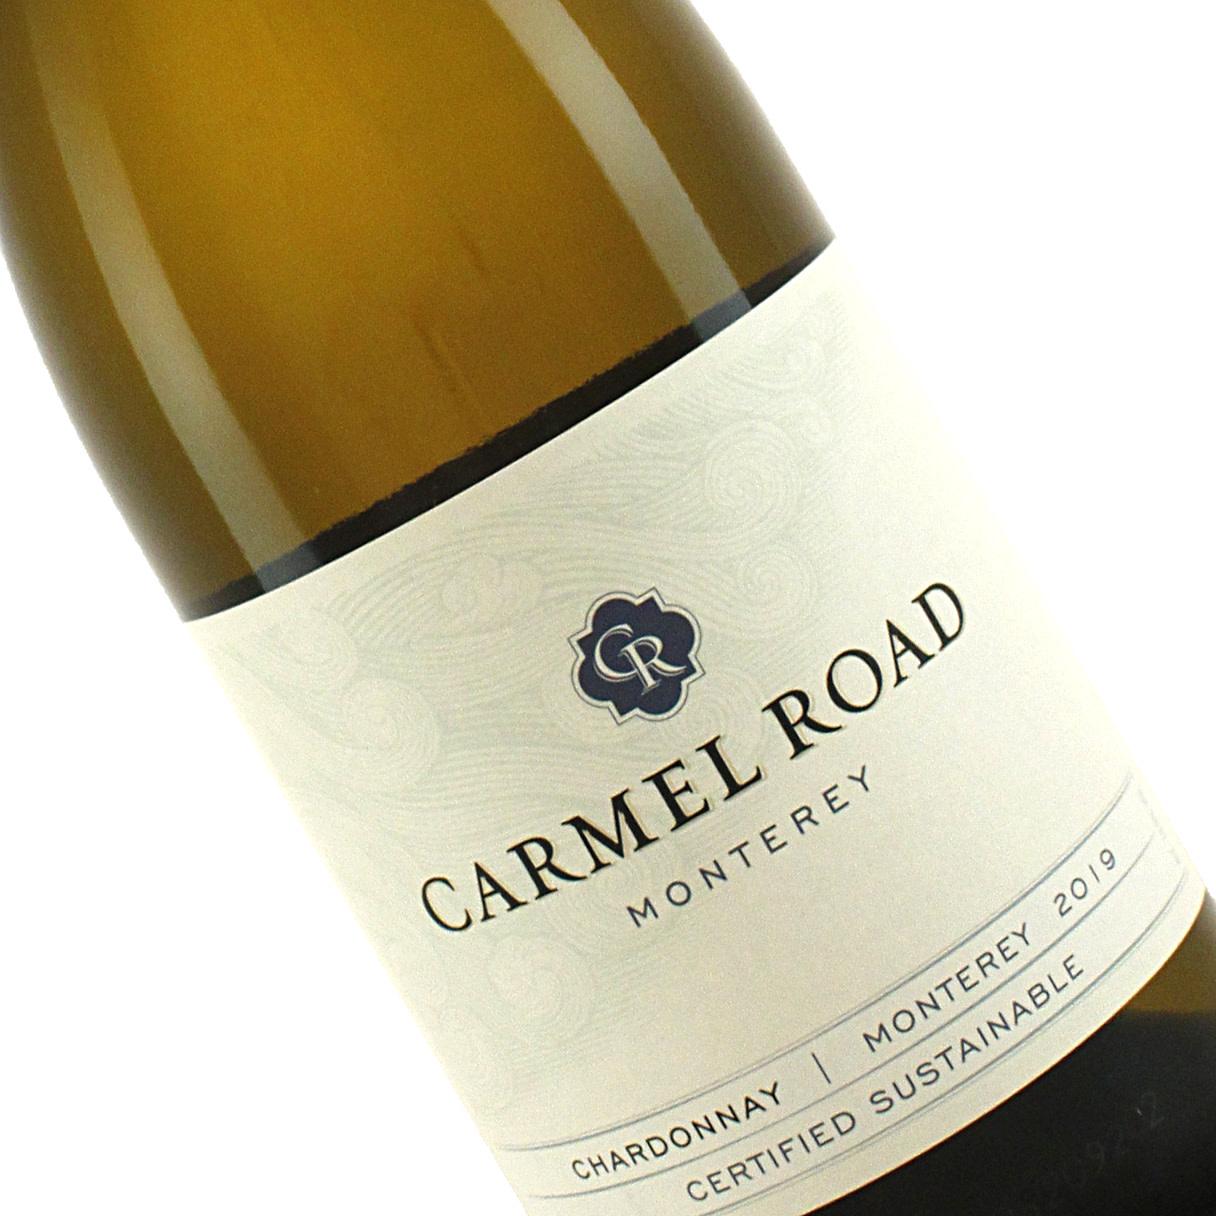 Carmel Road 2019 Chardonnay, Monterey